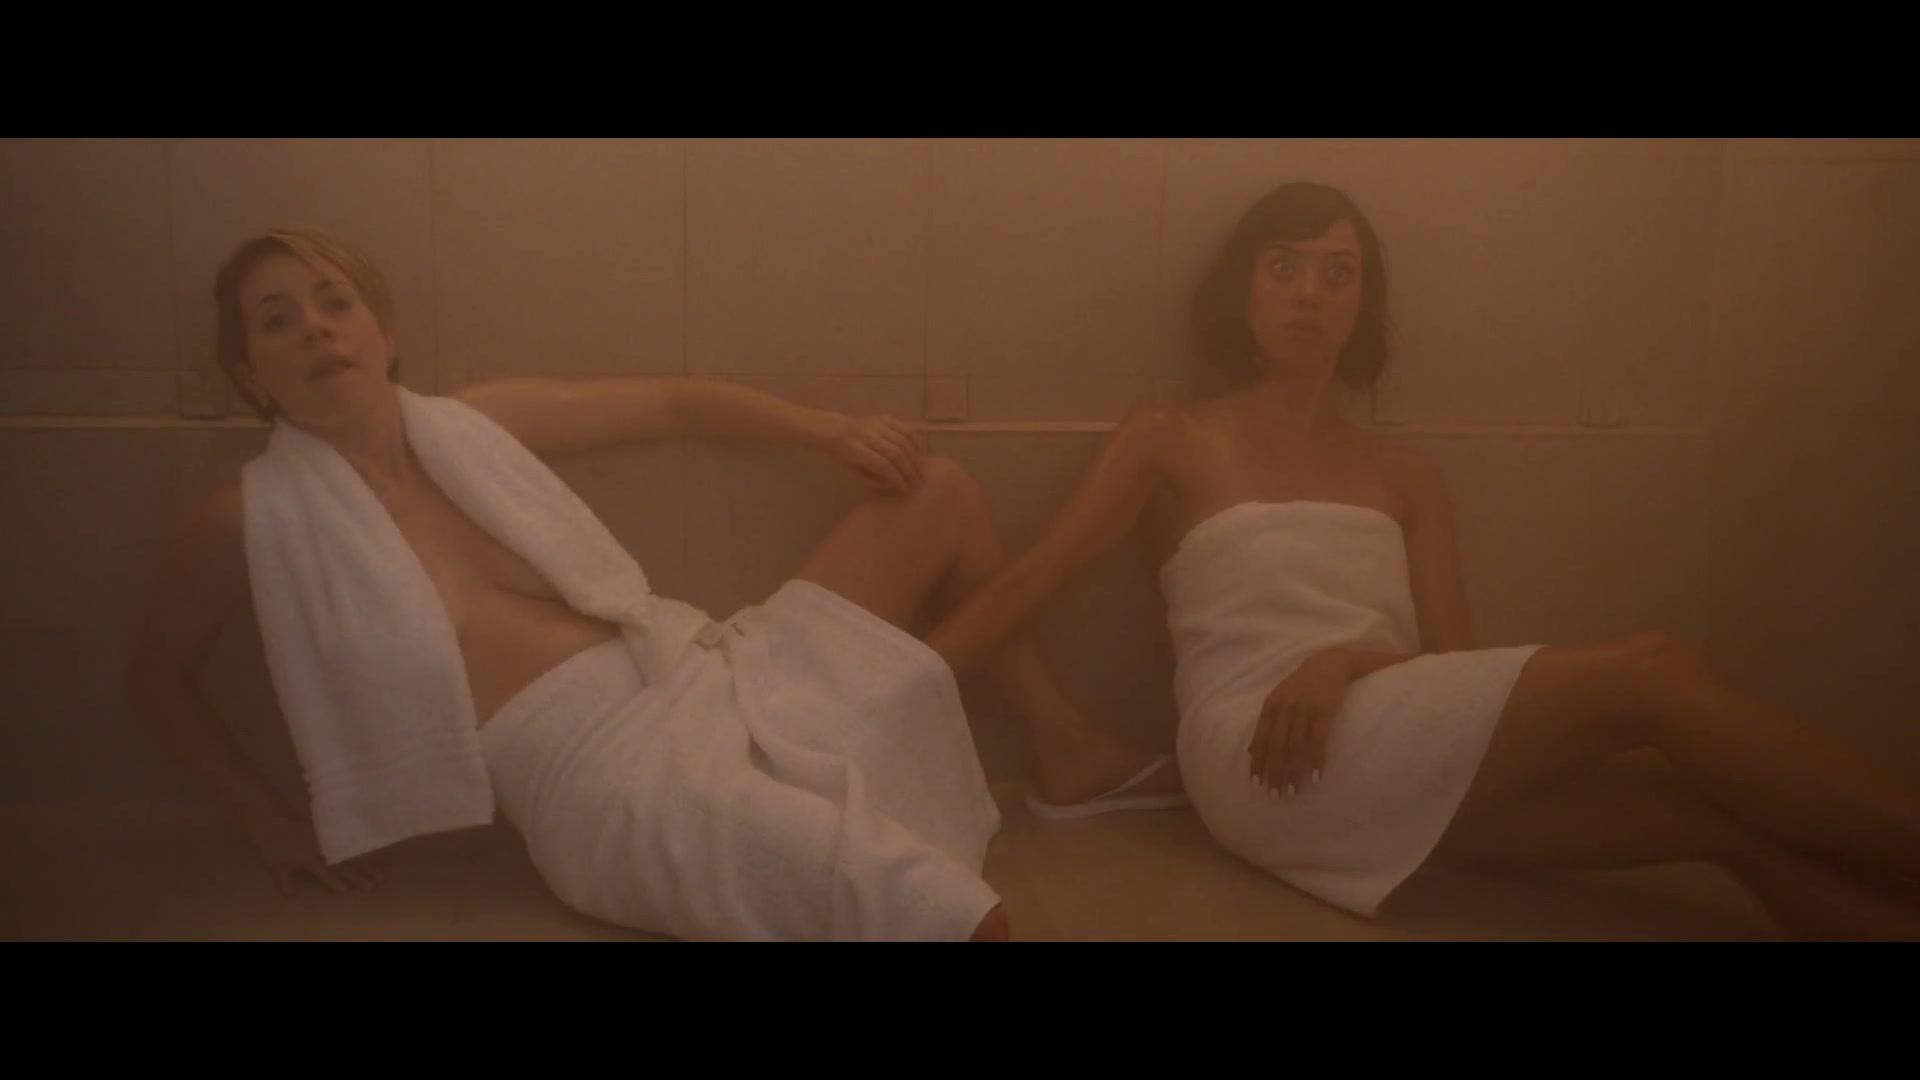 The wedding date movie sex nude pics scenes